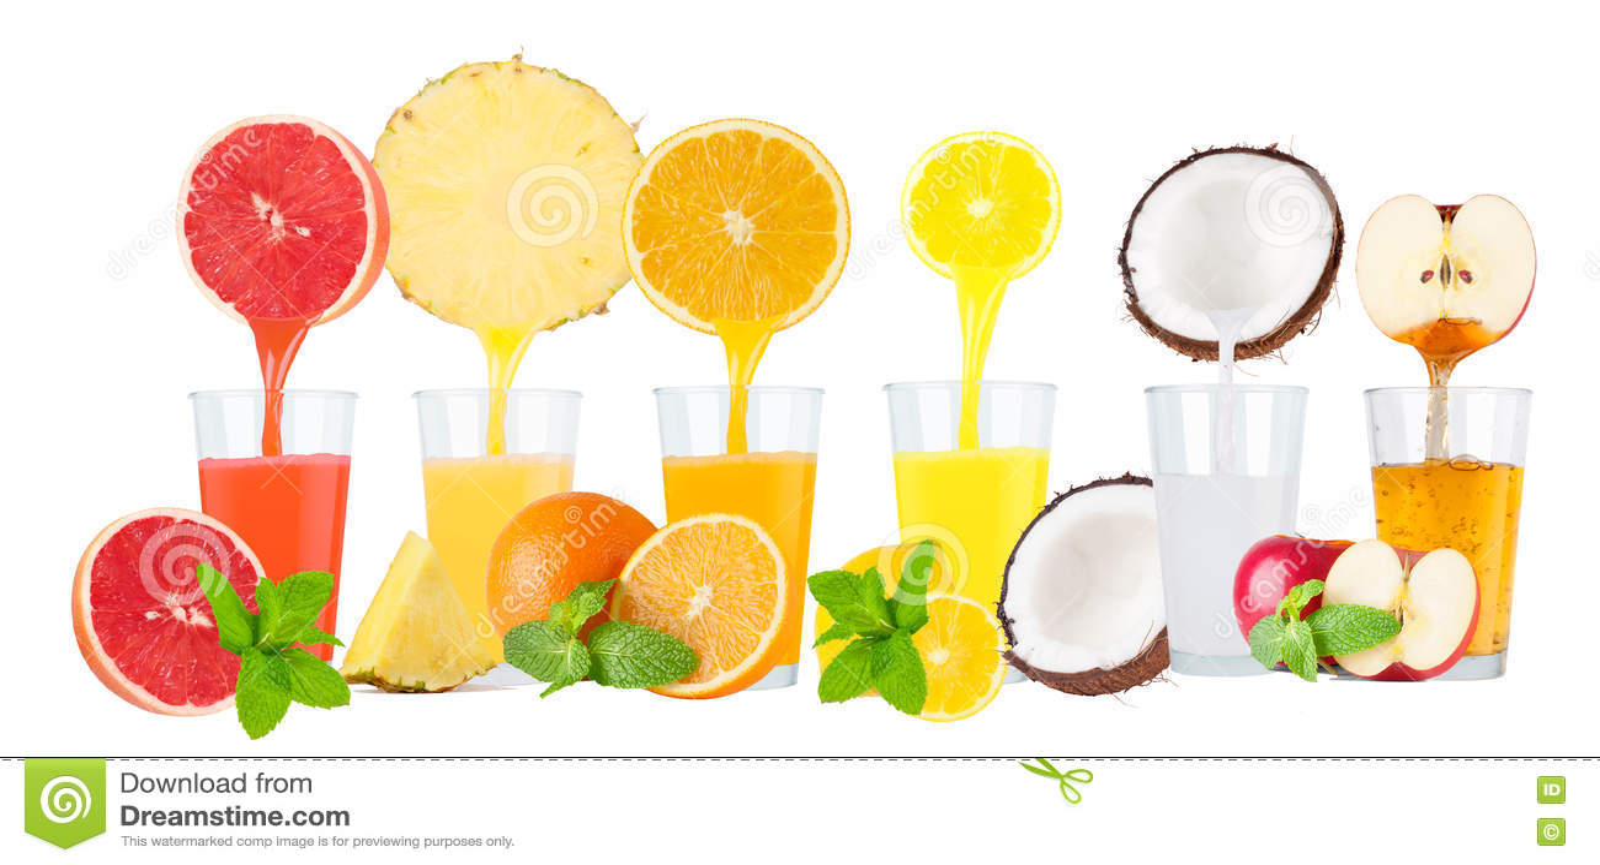 collage of fresh fruit juices on white background stock photo